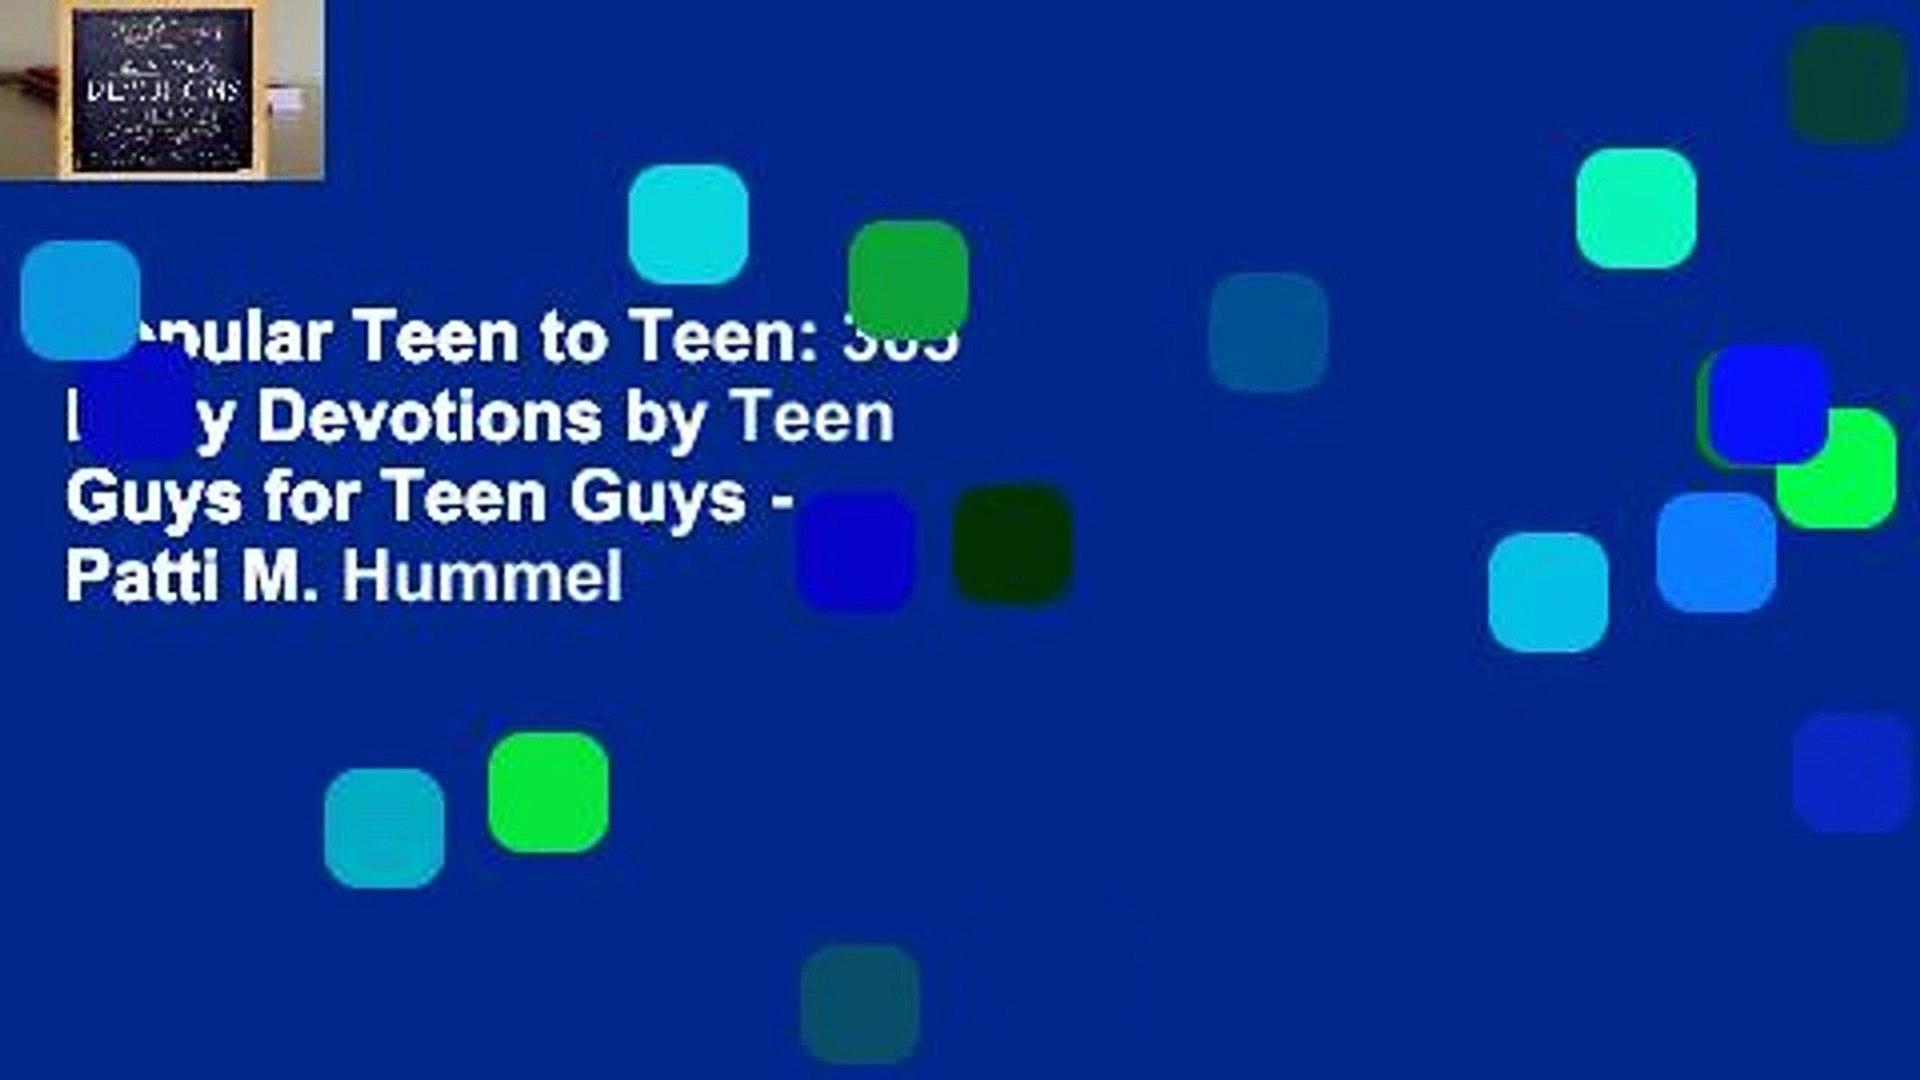 Popular Teen to Teen: 365 Daily Devotions by Teen Guys for Teen Guys - Patti M. Hummel